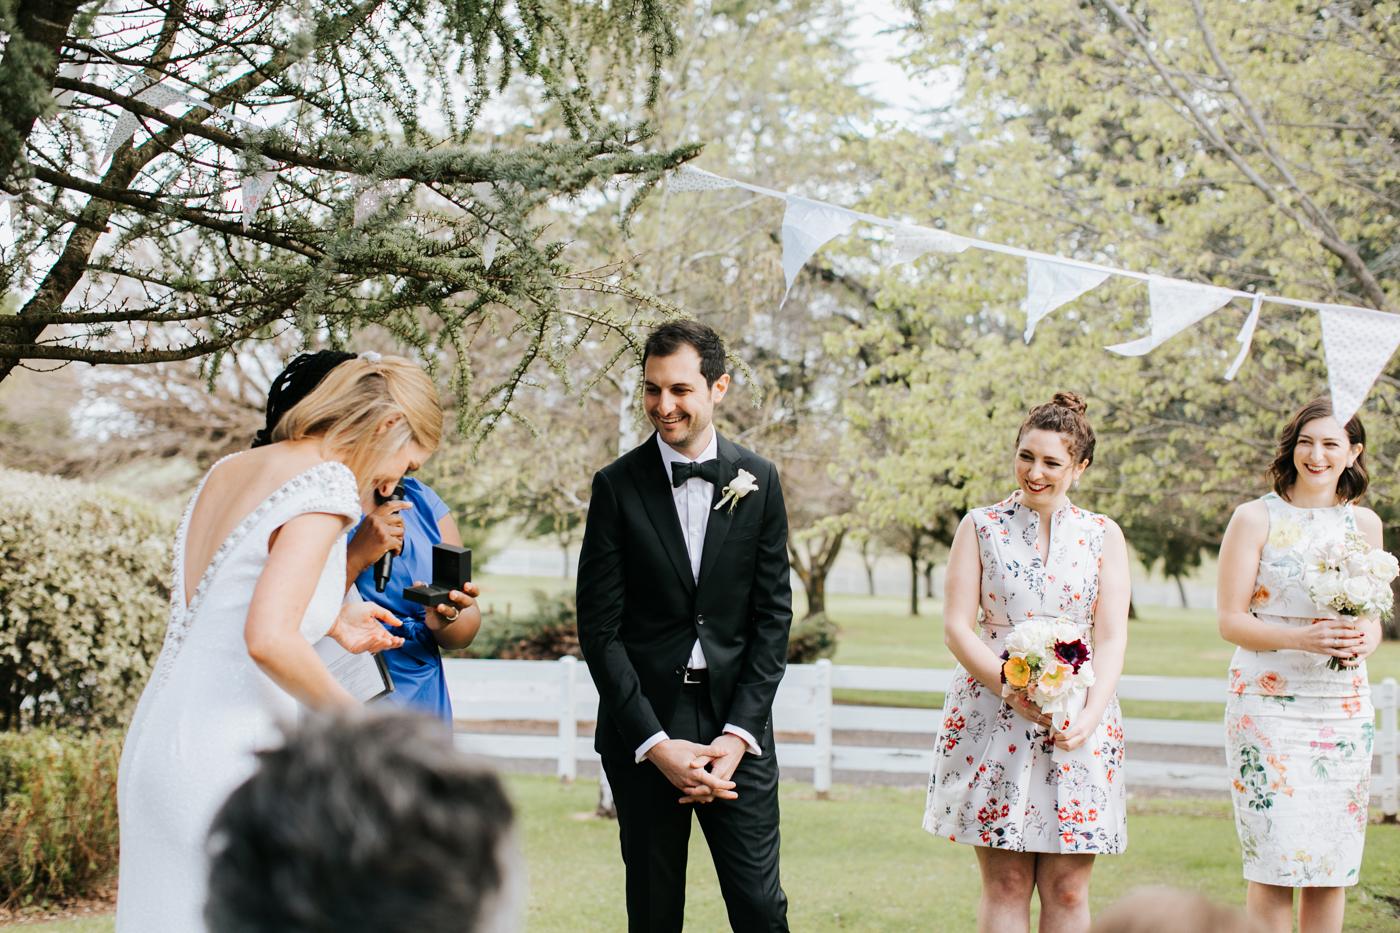 Bridget & James - Orange Country Wedding - Samantha Heather Photography-45.jpg